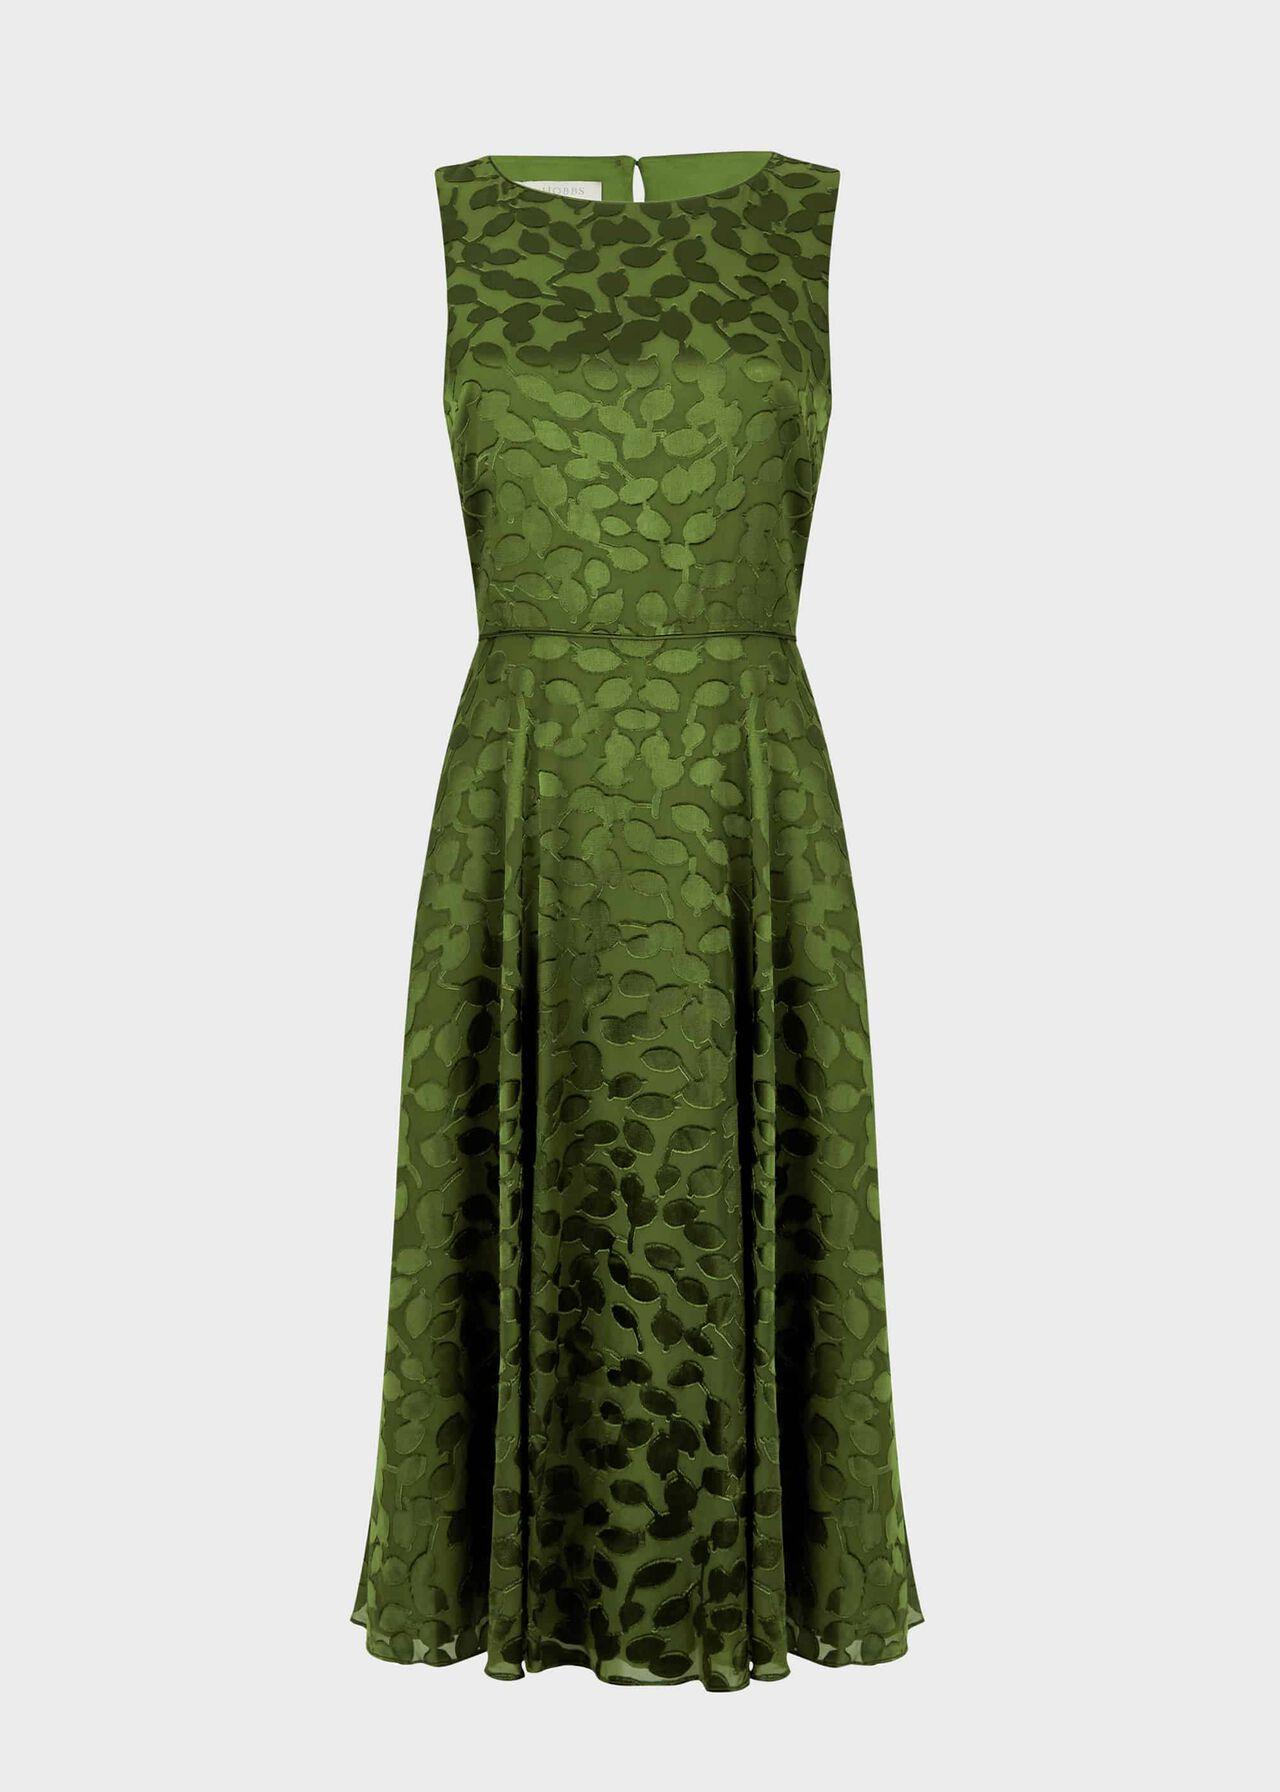 Adaline Jacquard Fit And Flare Dress Fern Green